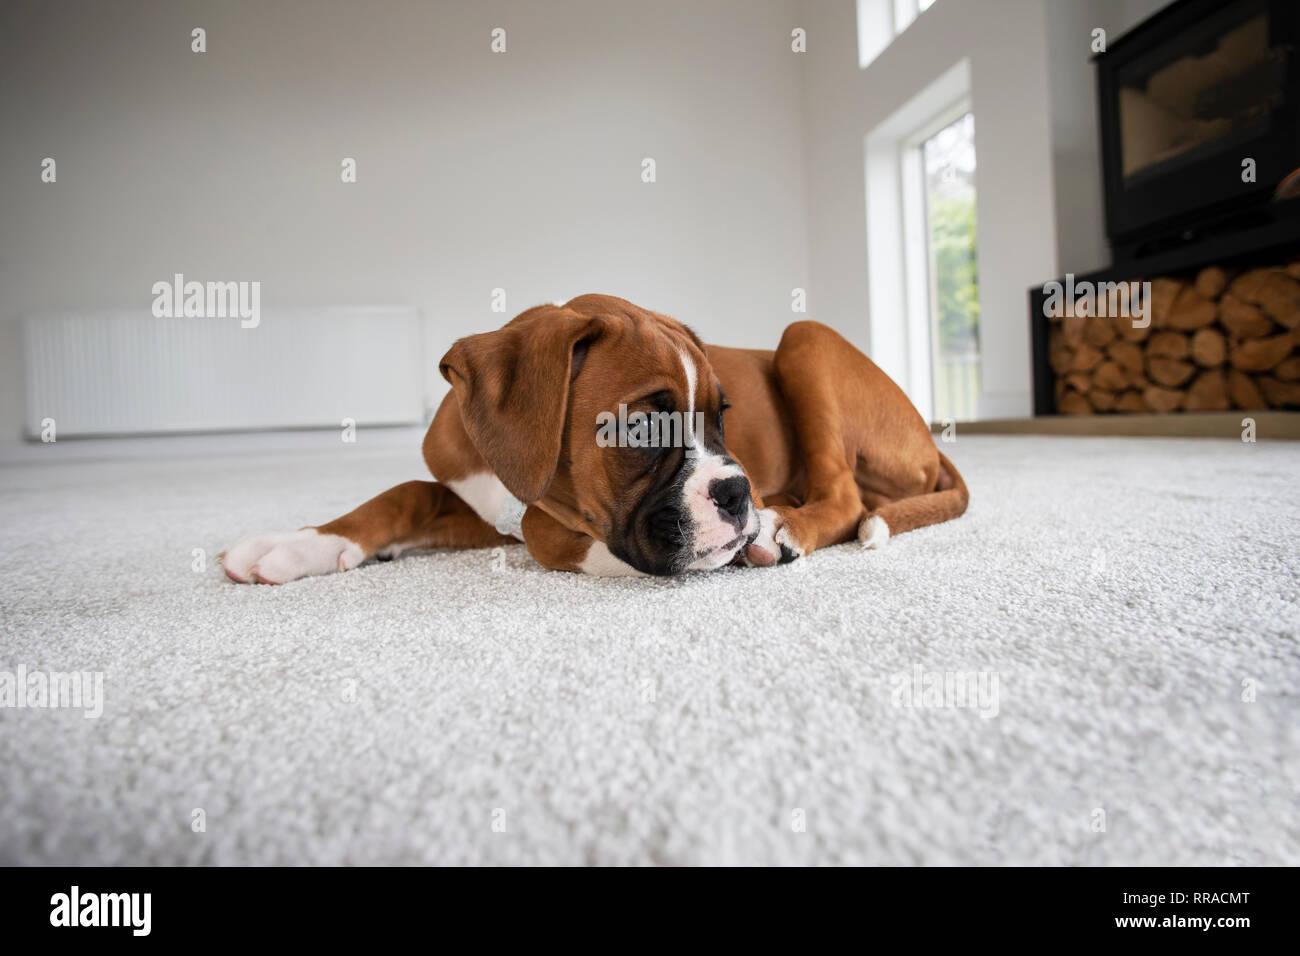 Ten week old boxer dog puppy lying on a white carpet at eye level - Stock Image